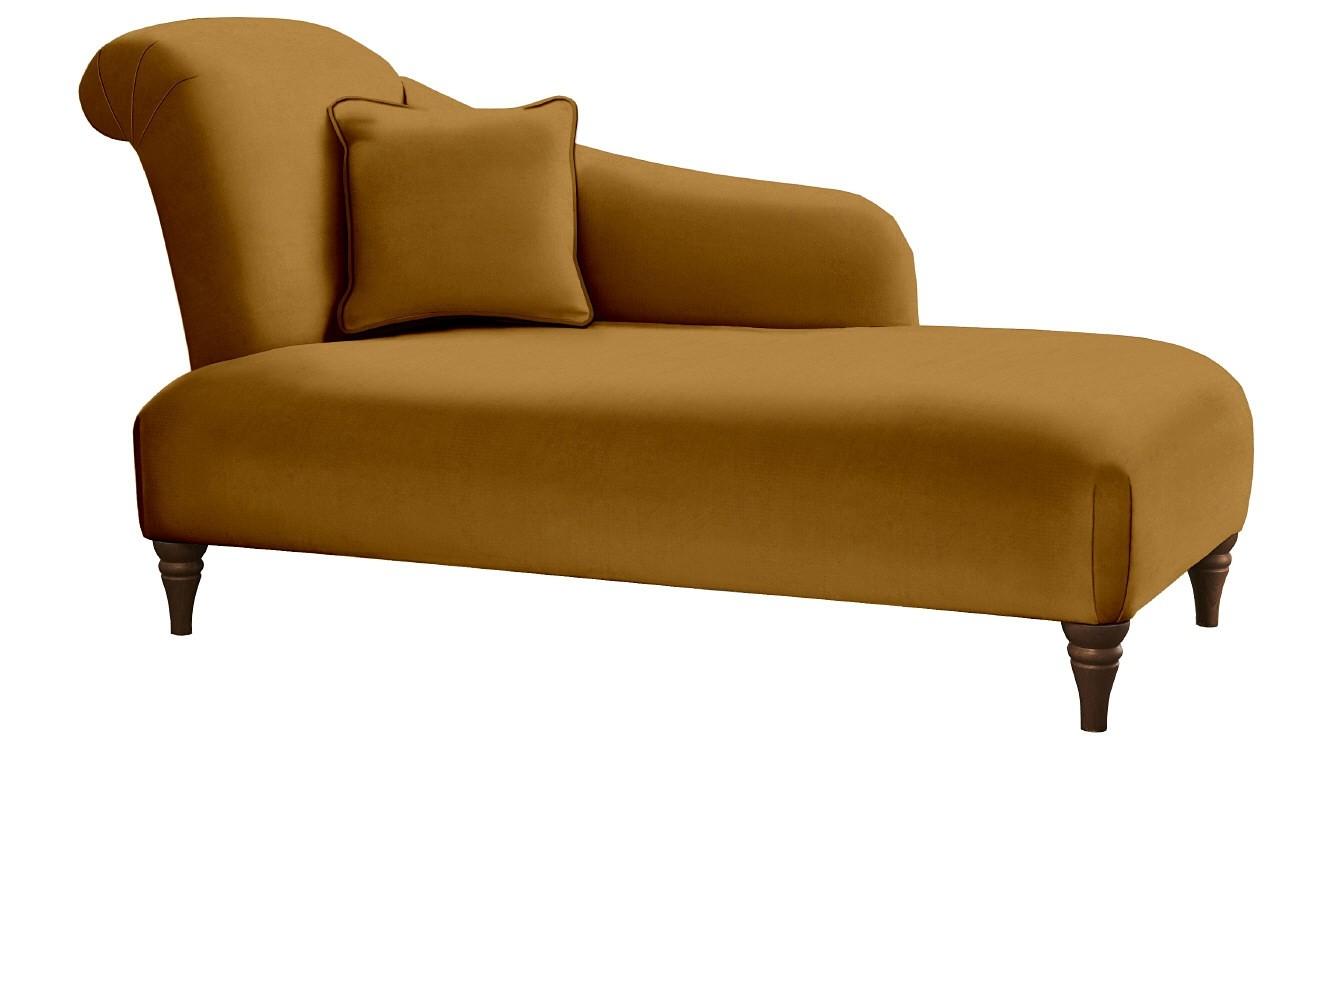 The Dunball Chaise Longue